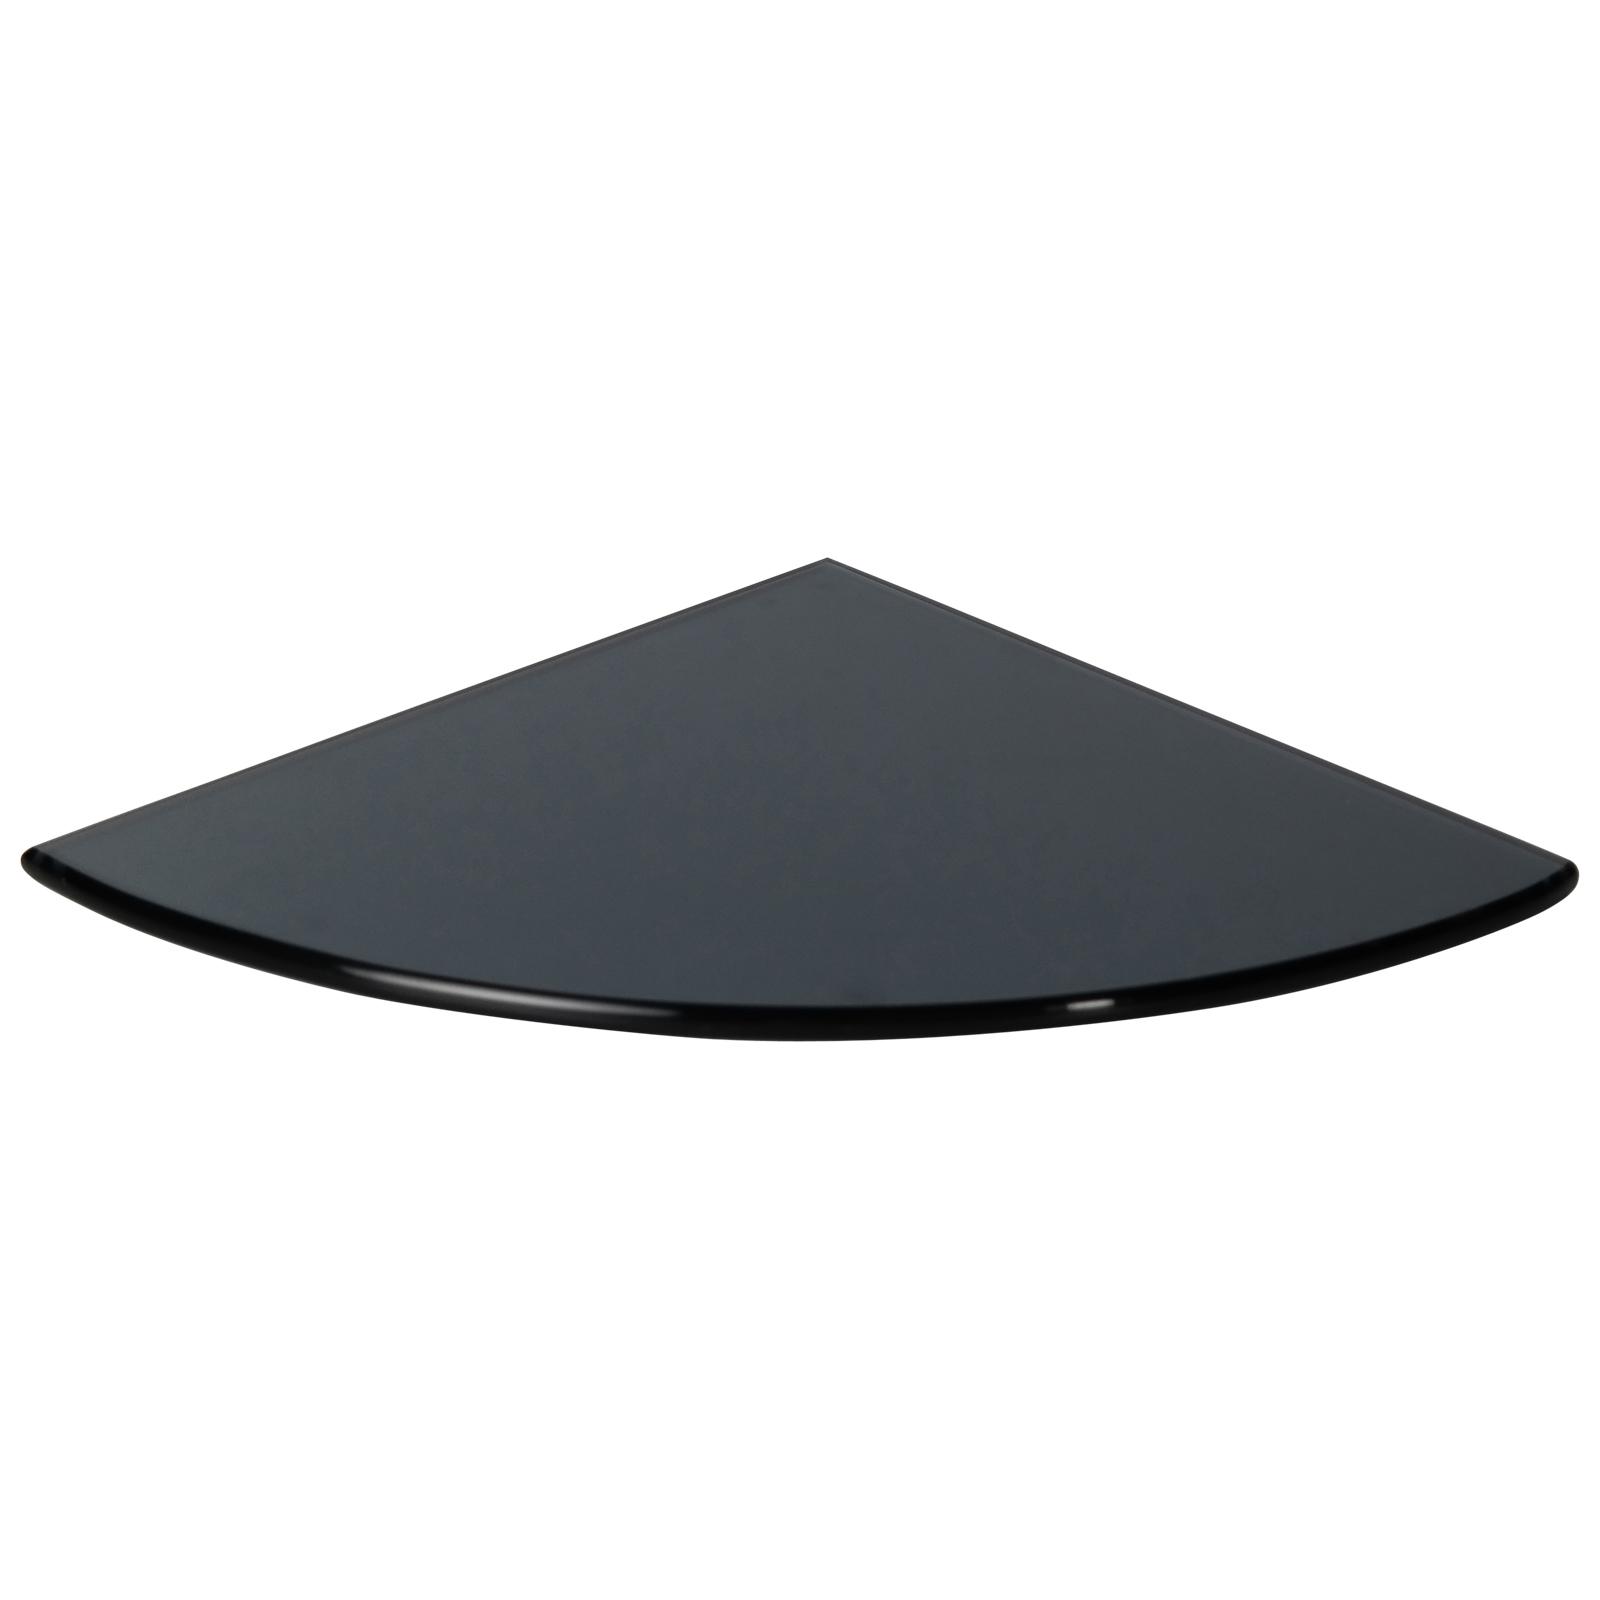 Black Tempered Glass Bathroom Caddy Corner Shelf   BGLRN34 ...